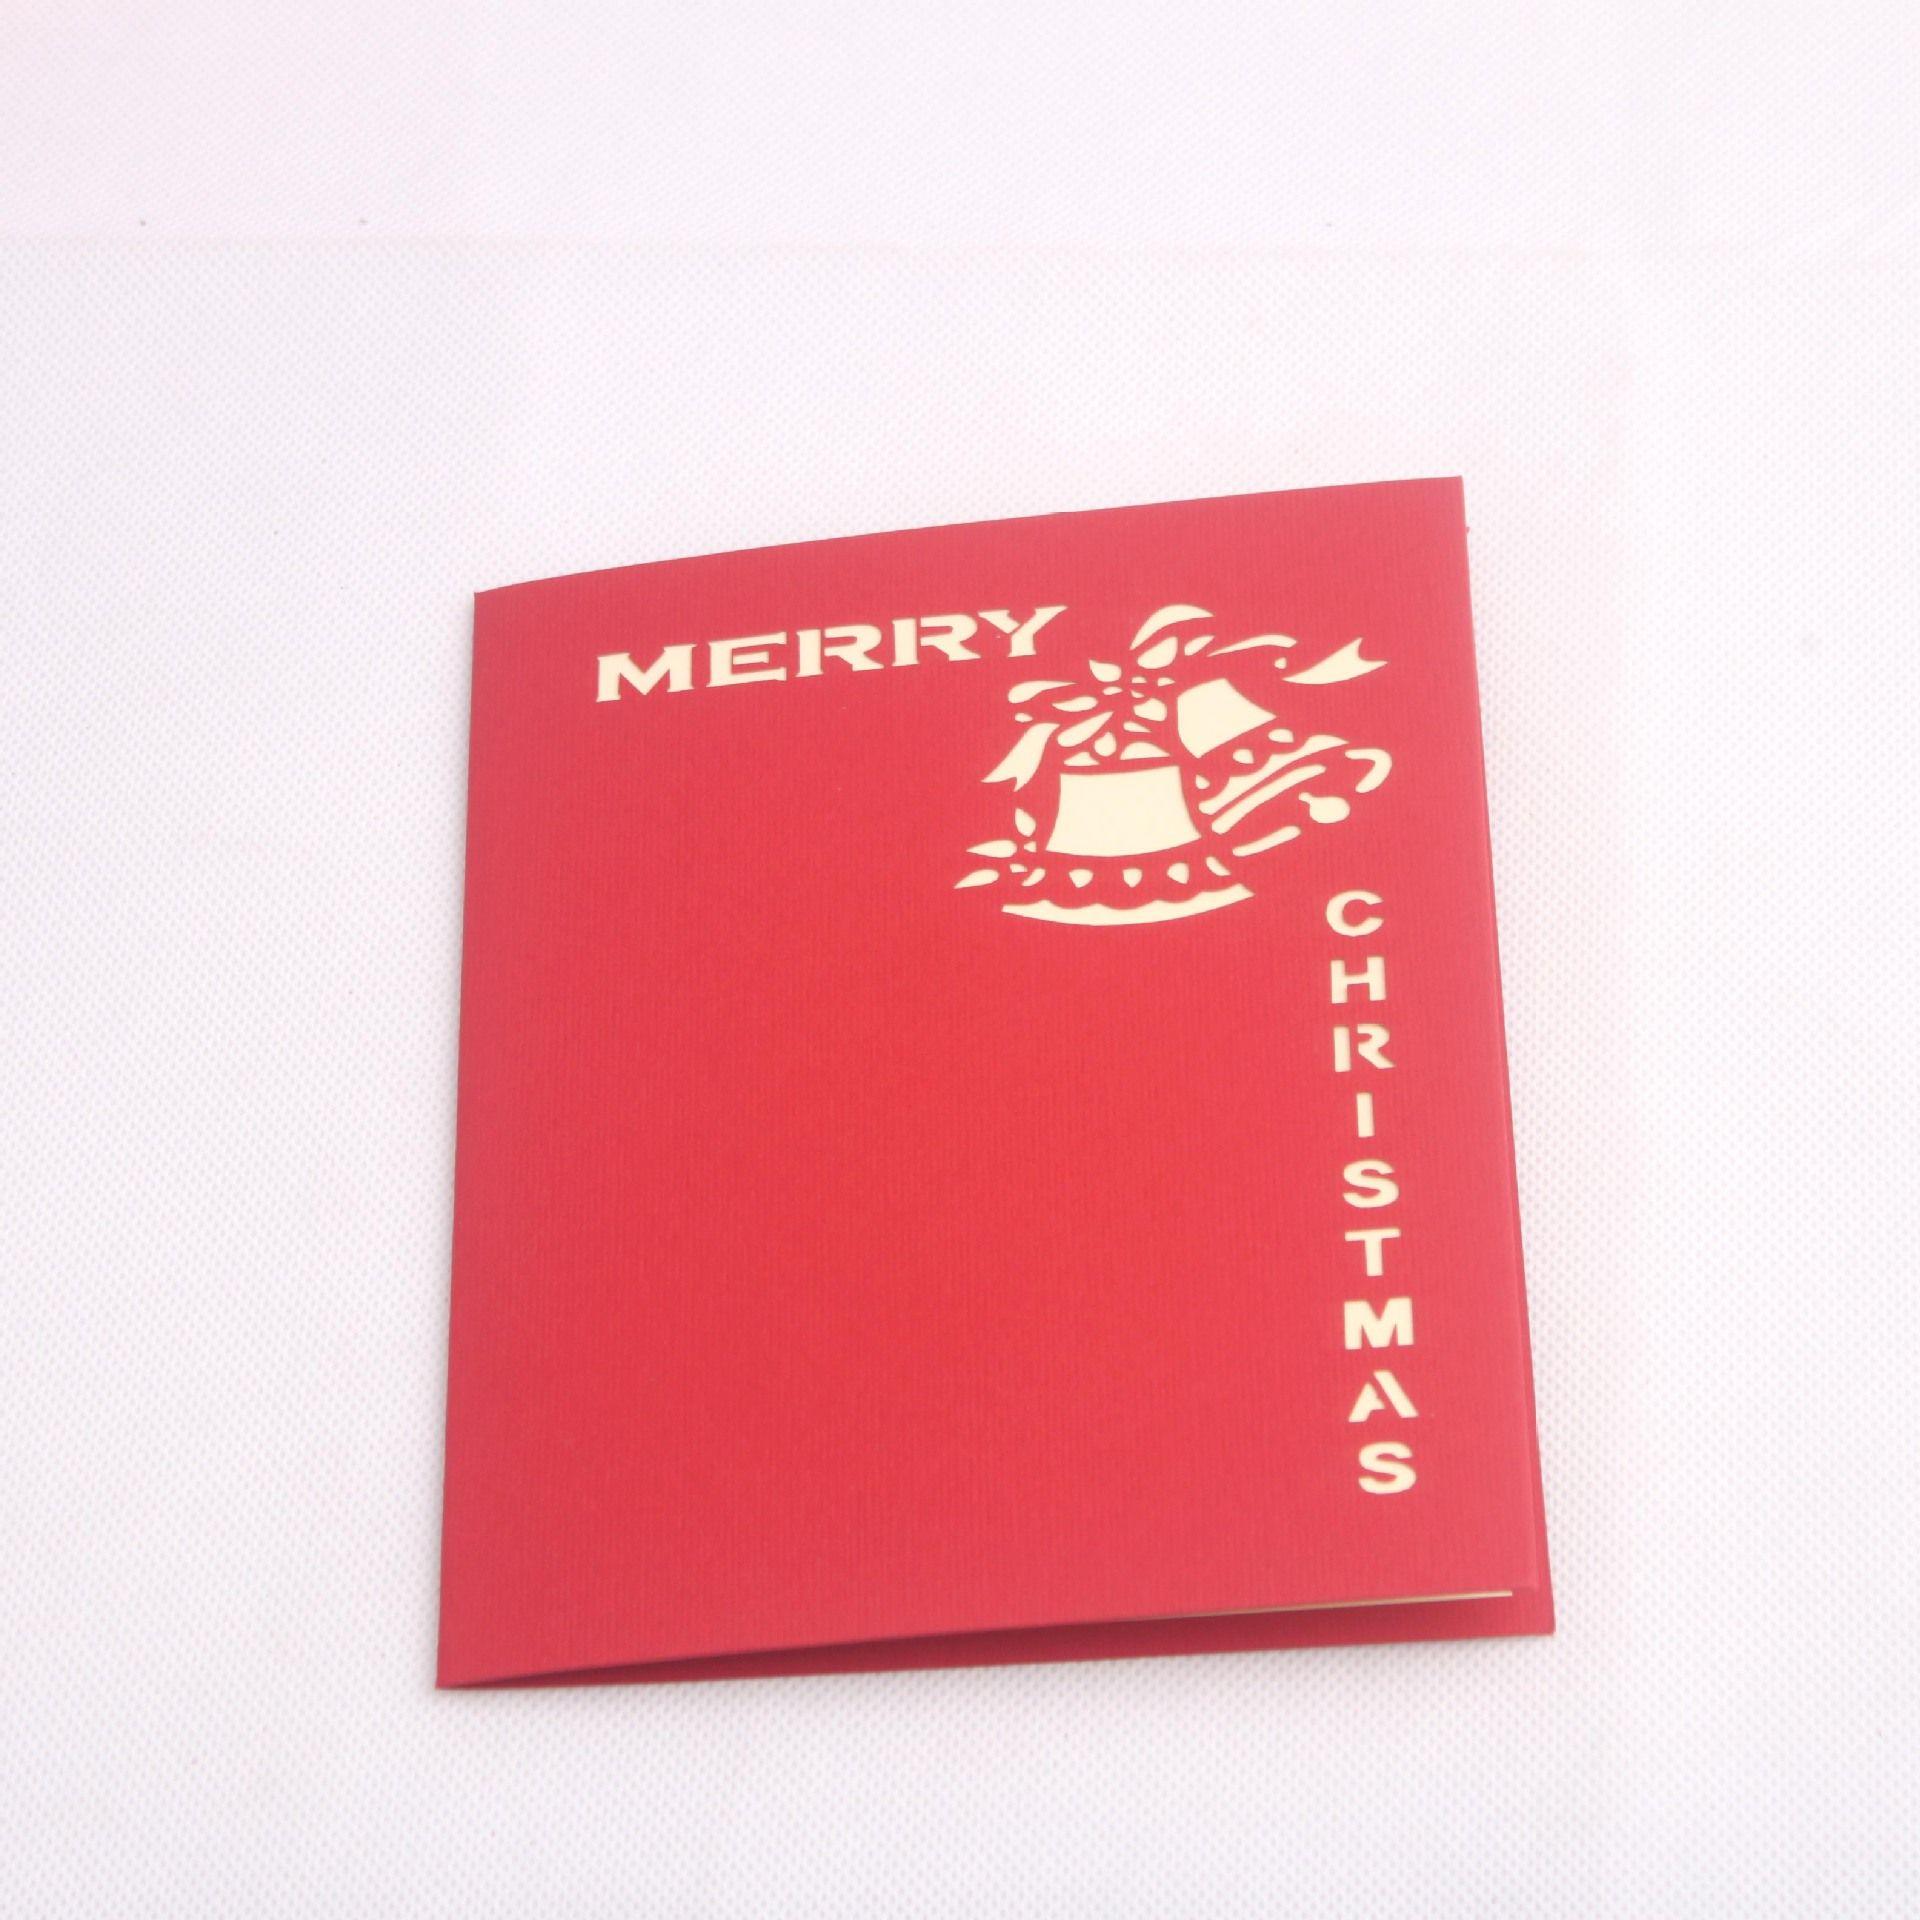 handmade kirigami origami 3d pop up card creative merry christmas